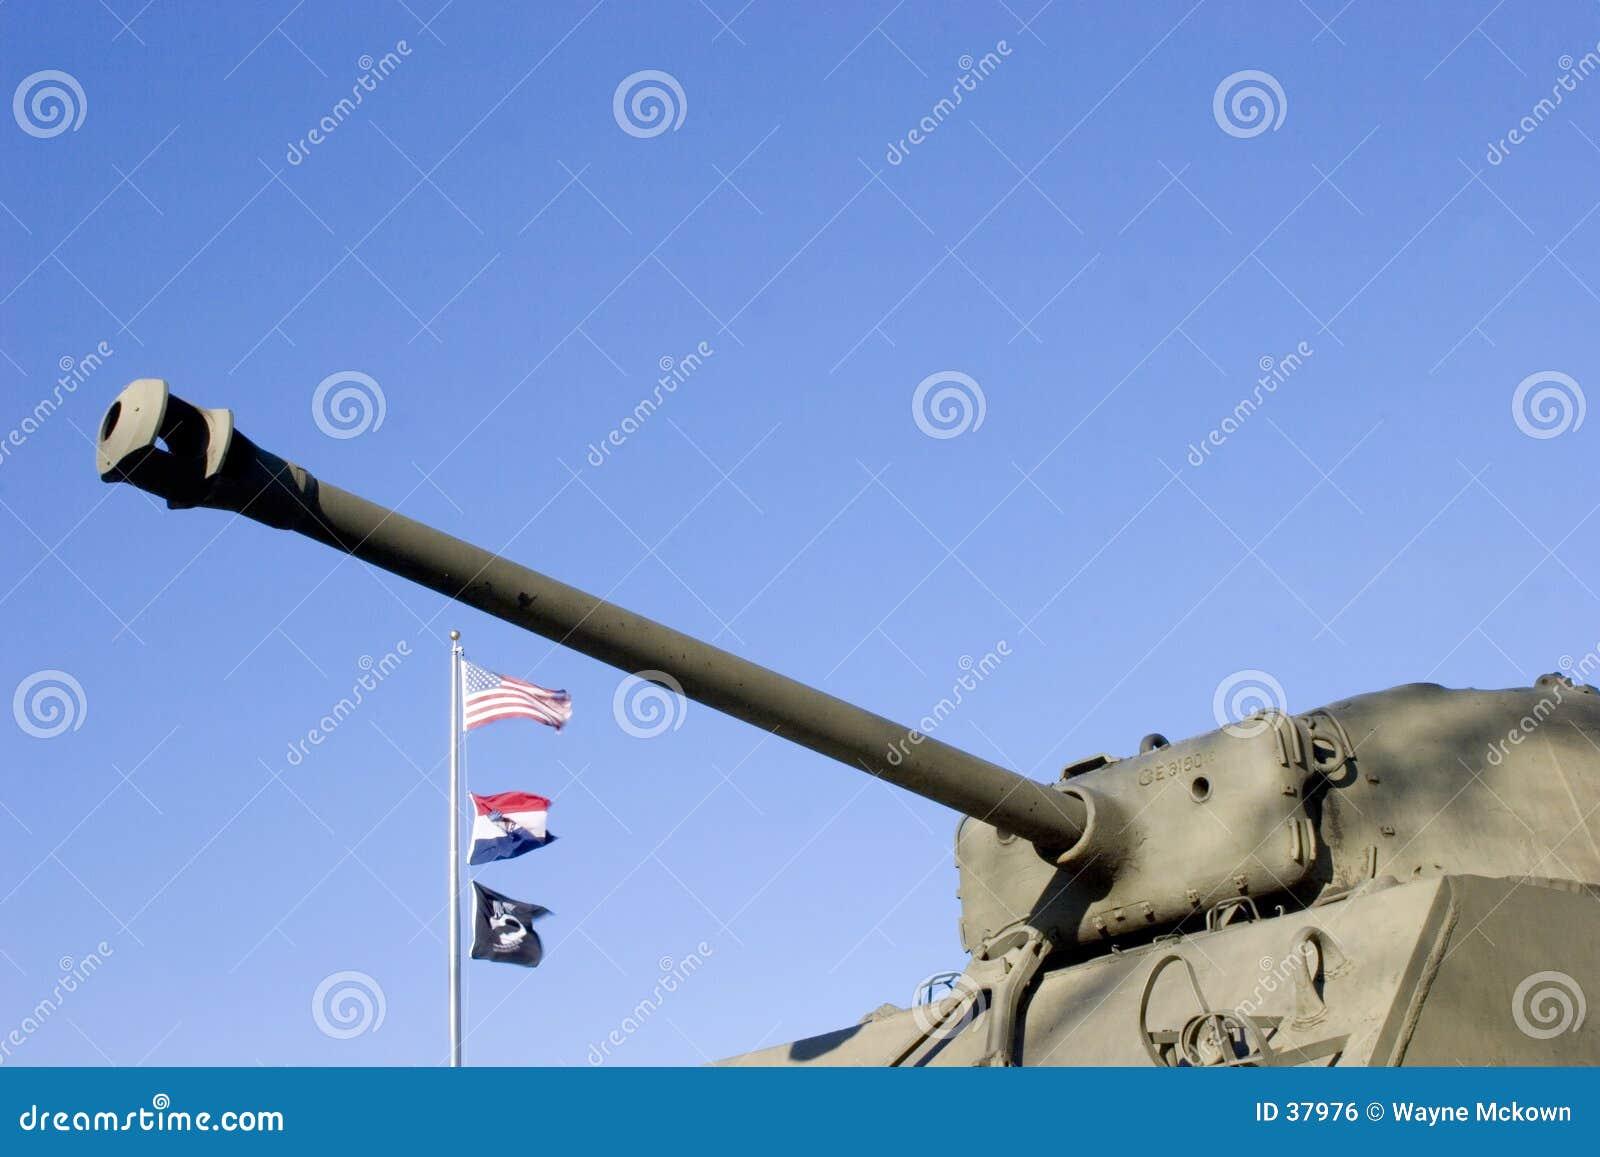 US army tank.